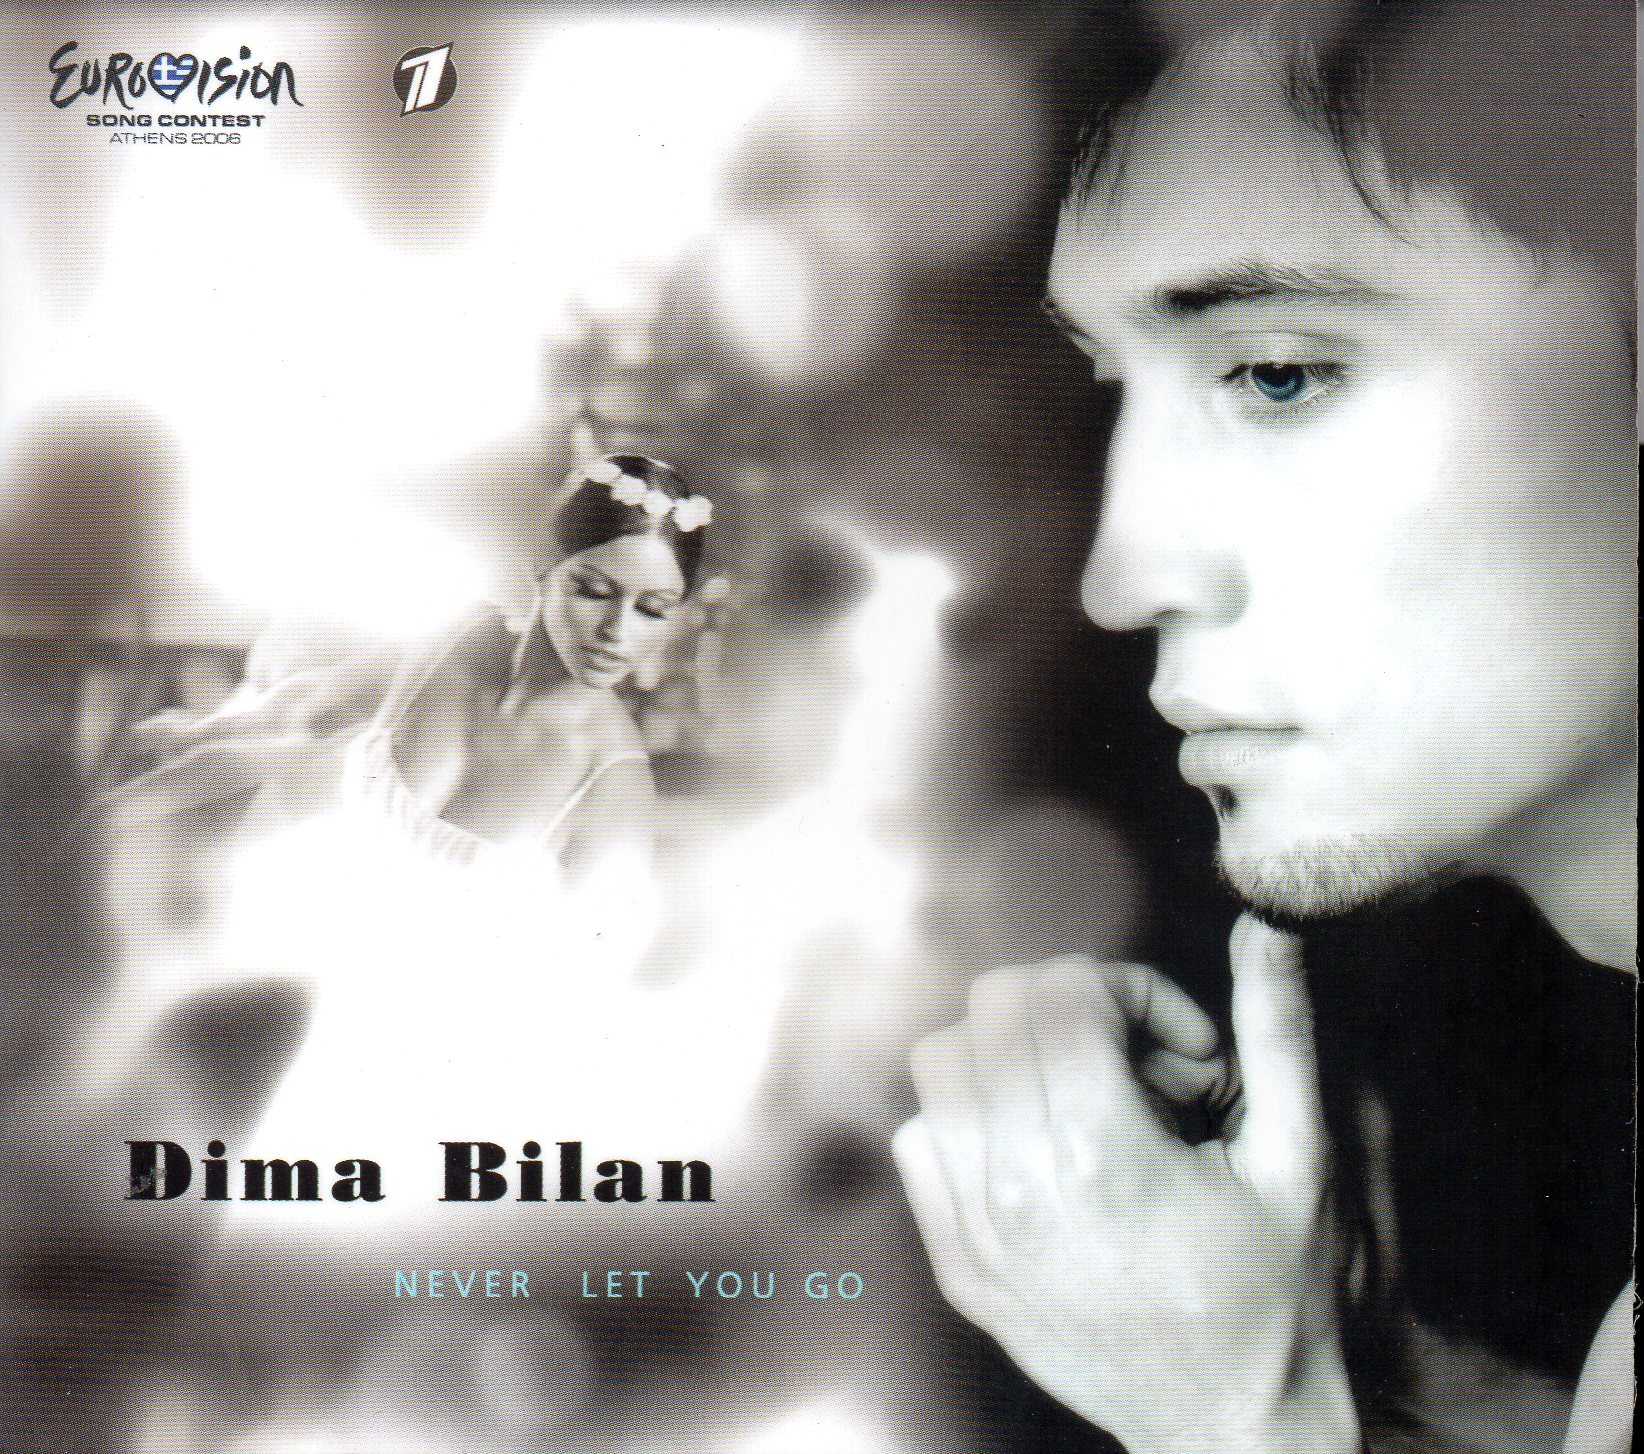 EUROVISION 2006 RUSSIE : DIMA BILAN - Never let you go Promo 4-track Digipack - CD Maxi